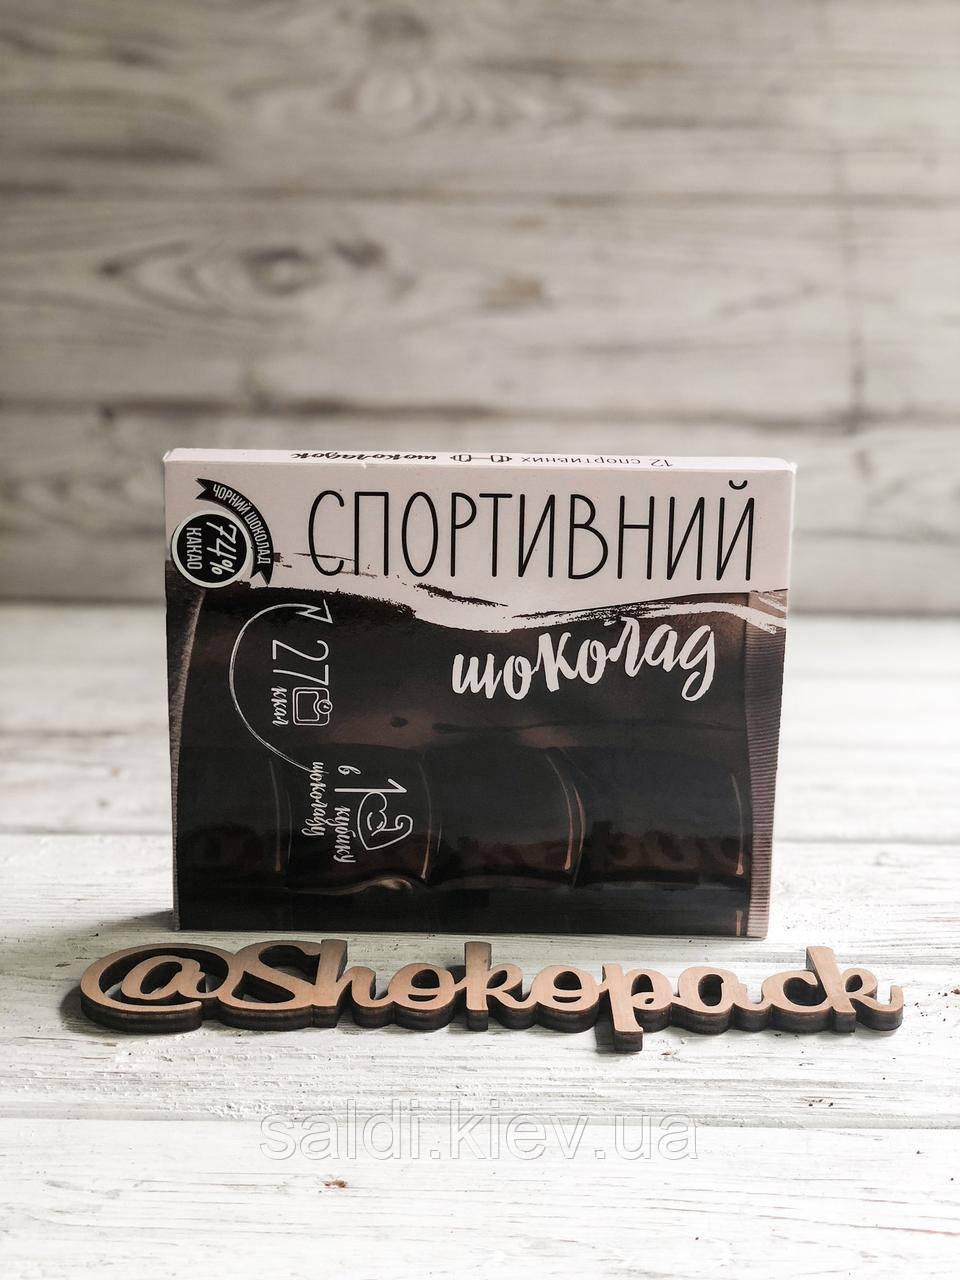 Шоколадный НАБОР НА 12 ШОКОЛАДОК «СПОРТИВНИЙ ШОКОЛАД»